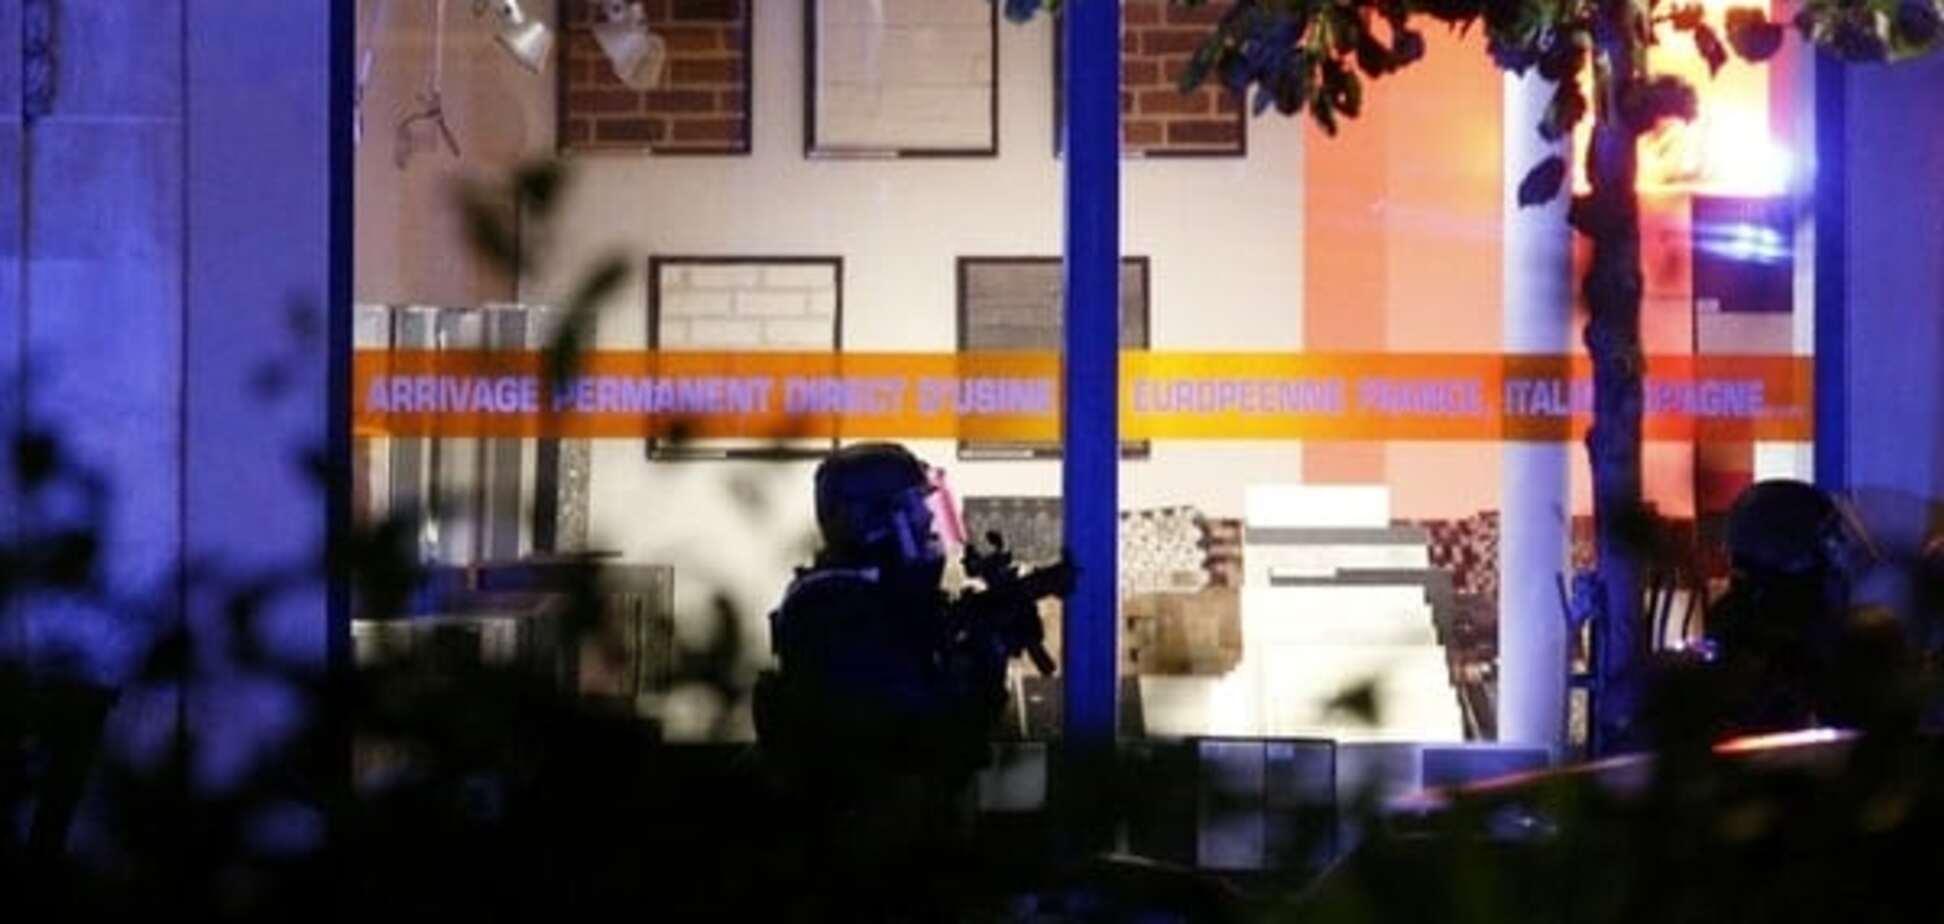 Cherchez la femme: постпред Украины в ООН назвал имя организатора терактов в Париже